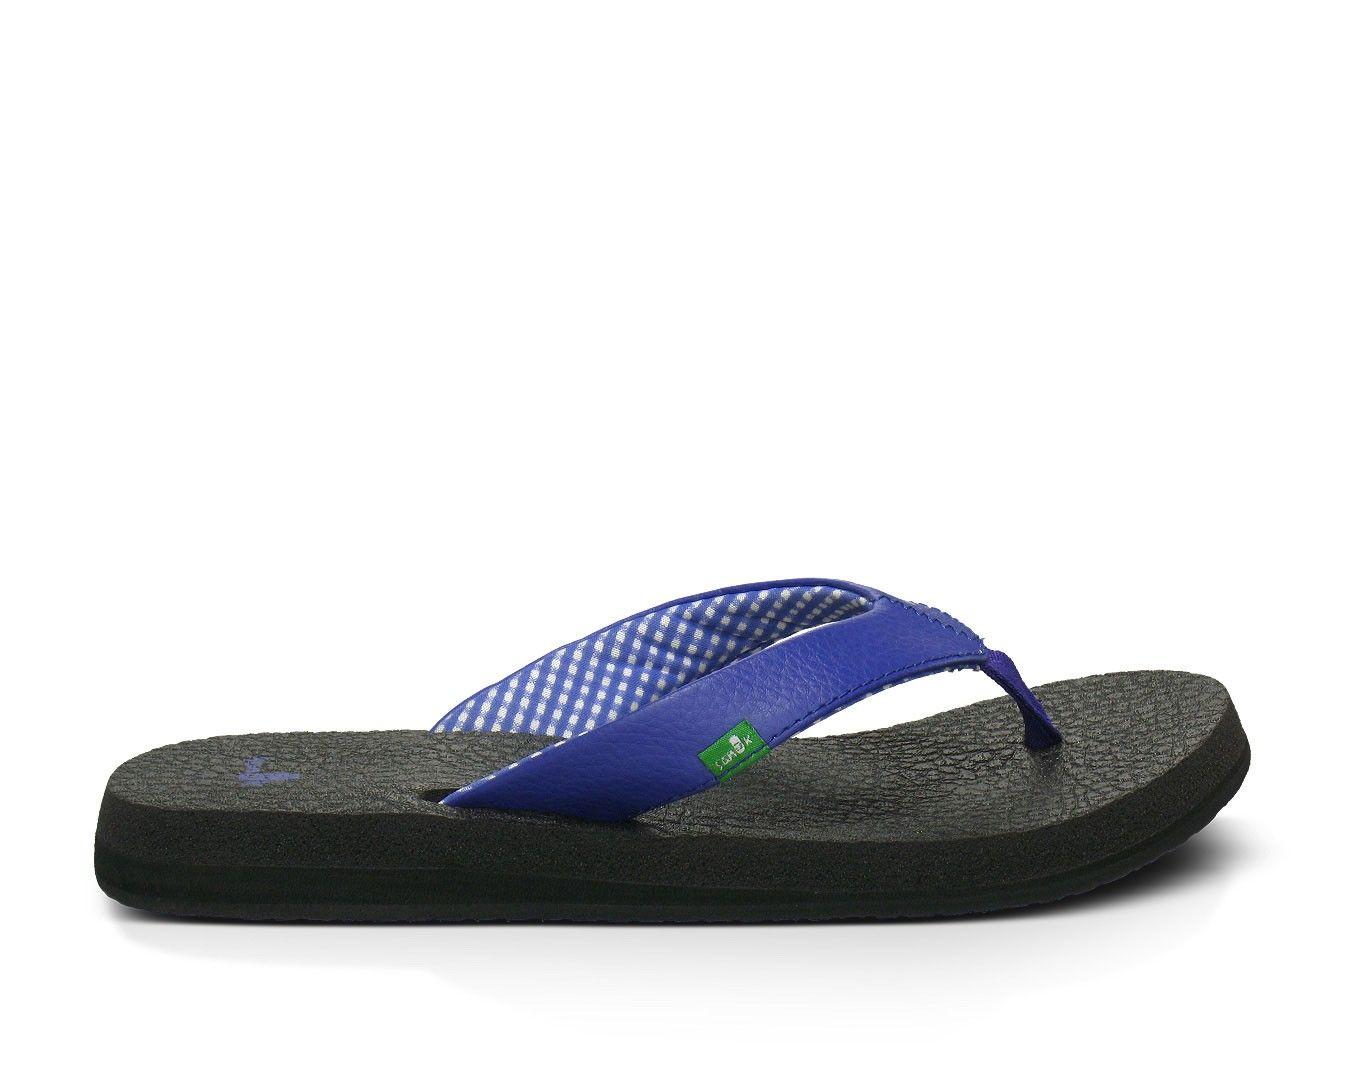 pin flip flopsmost flipping yoga sanuk mat flops and sandals mats